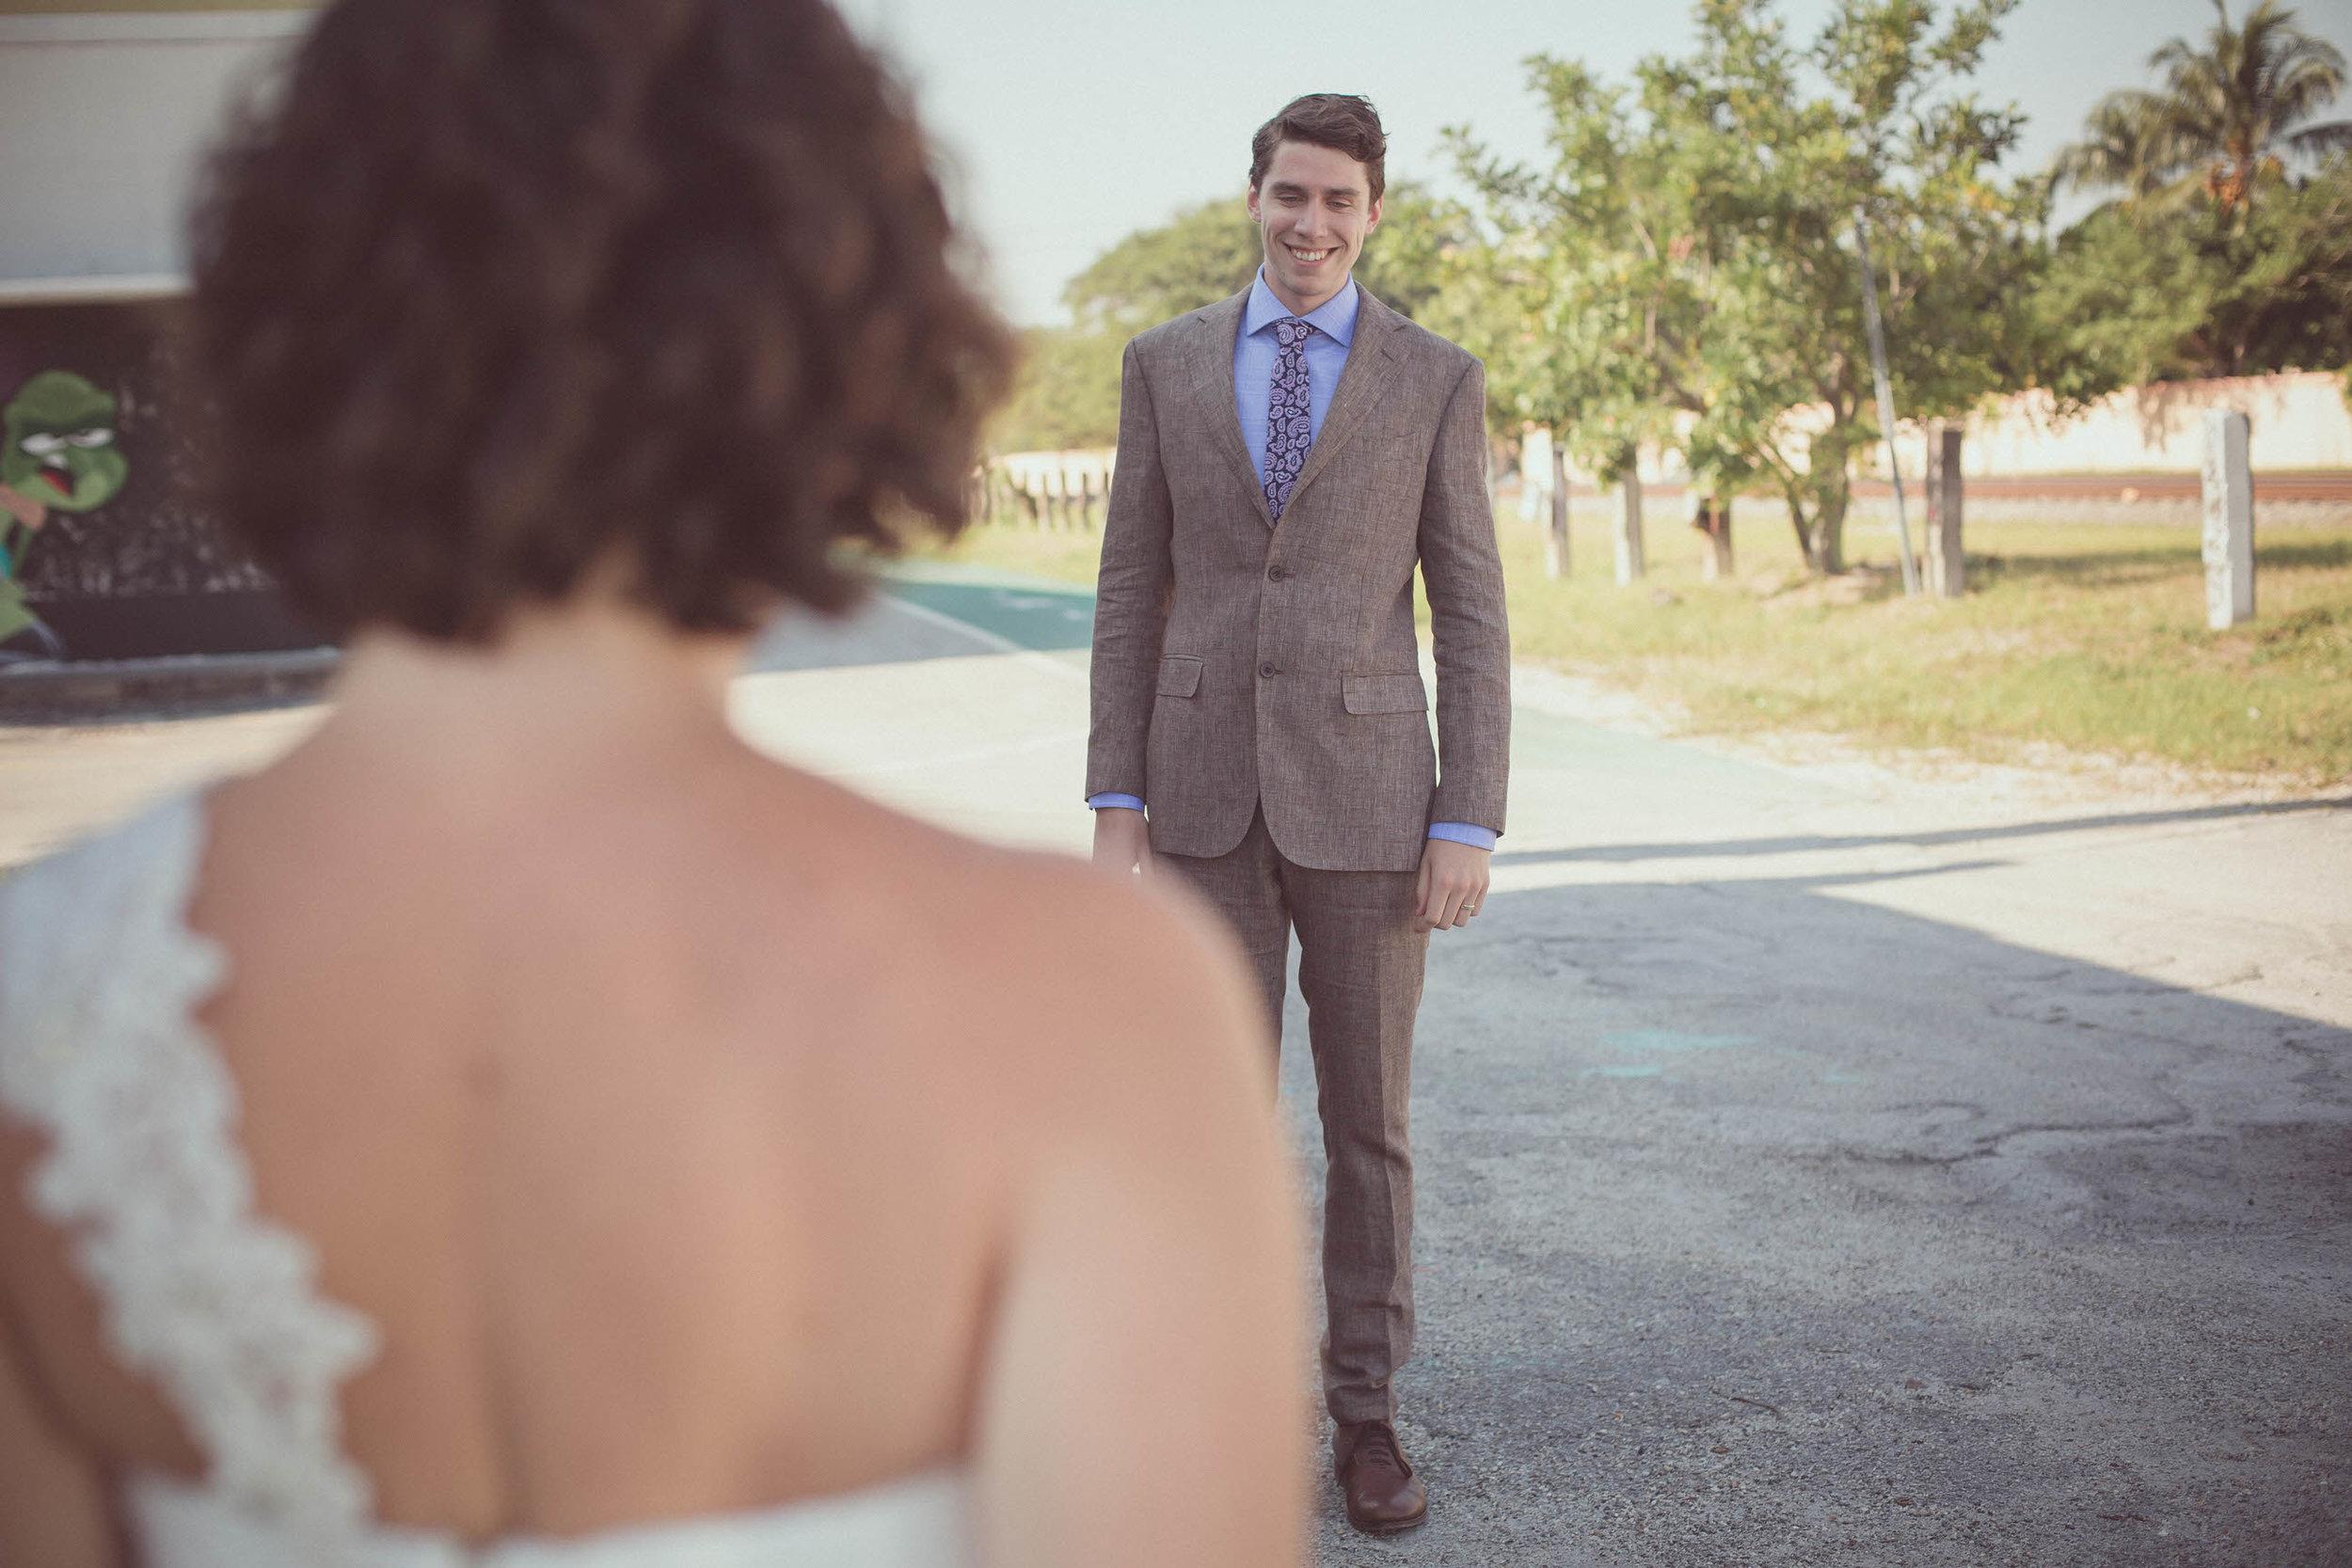 first-look-bride-groom-tiny-house-photo.jpg